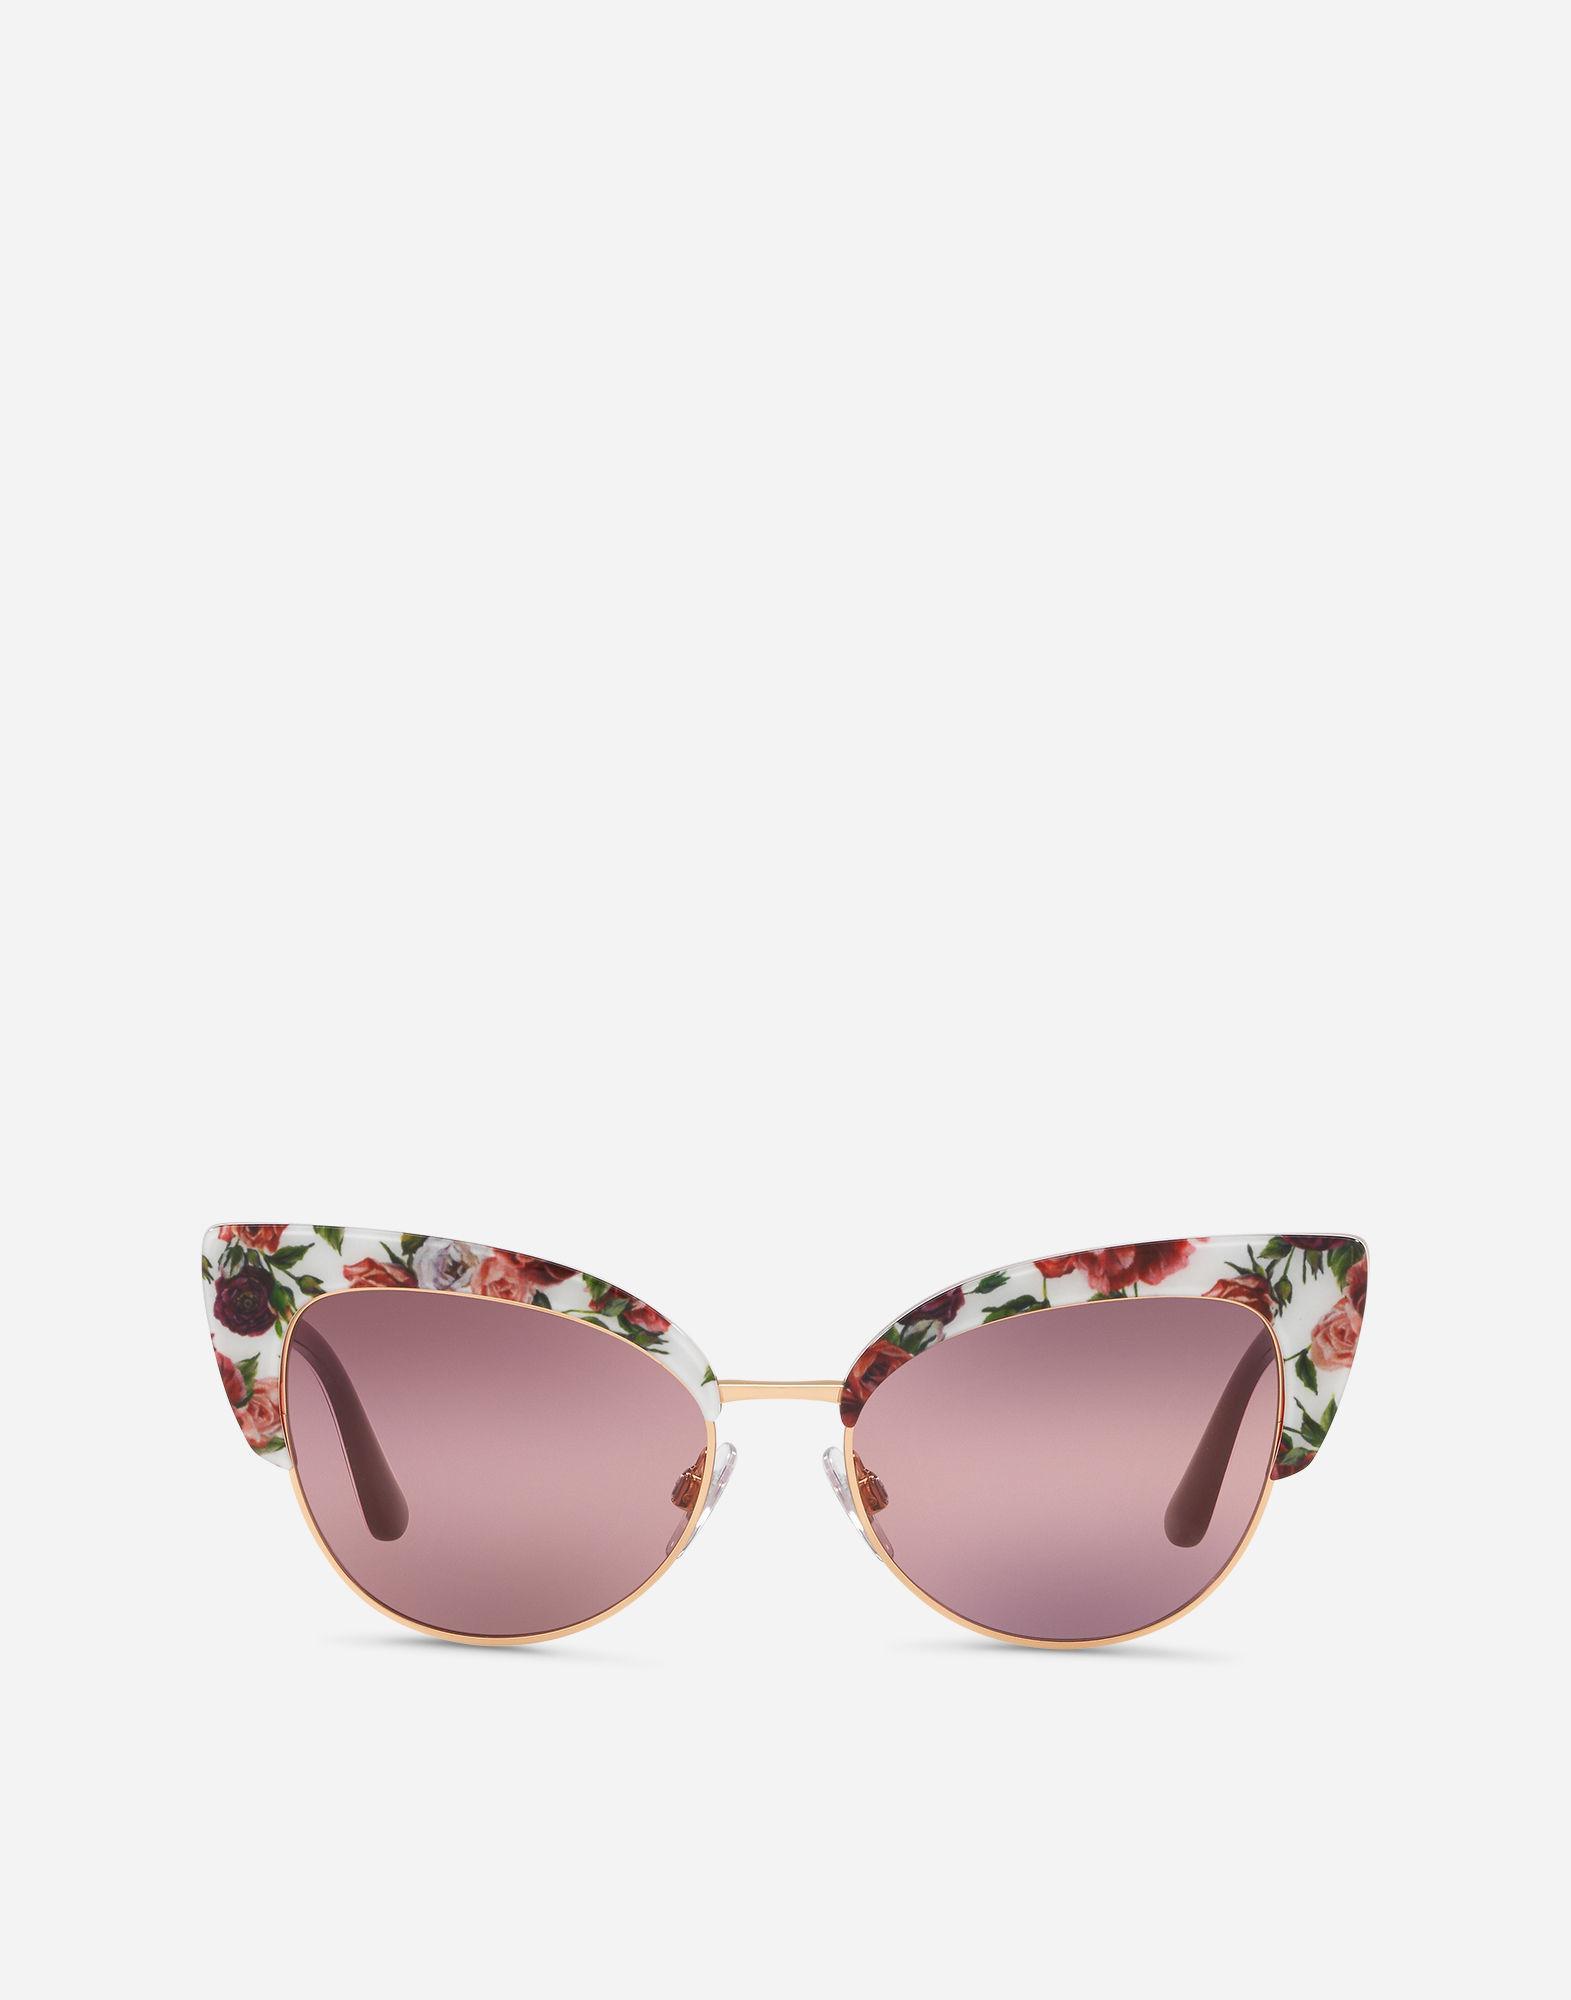 e58e5d769fdf Dolce   Gabbana. Women s Print Family Sunglasses